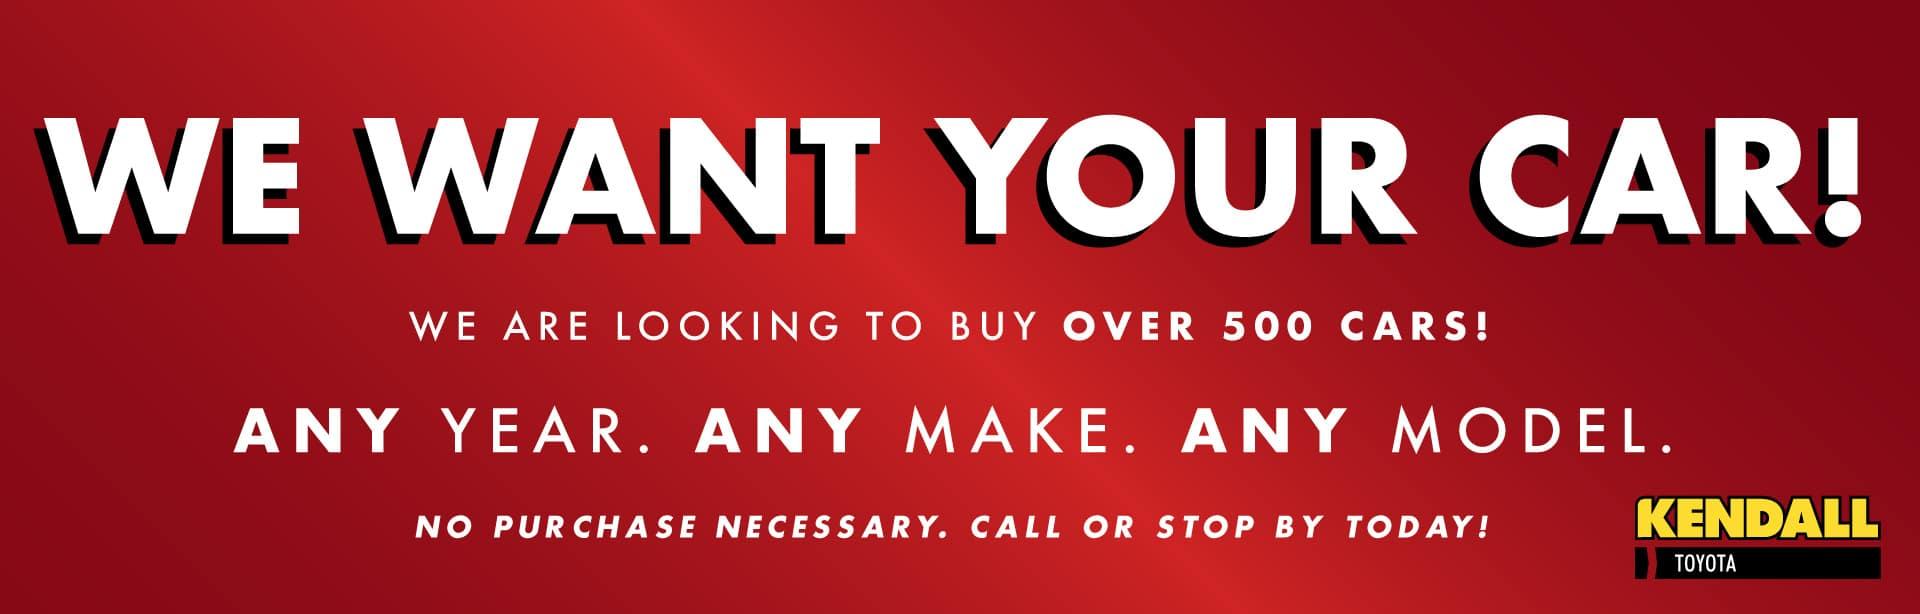 16484-eugtoy-Aug20-We-Want-Your-Car-Digital-Graphics-1920×614